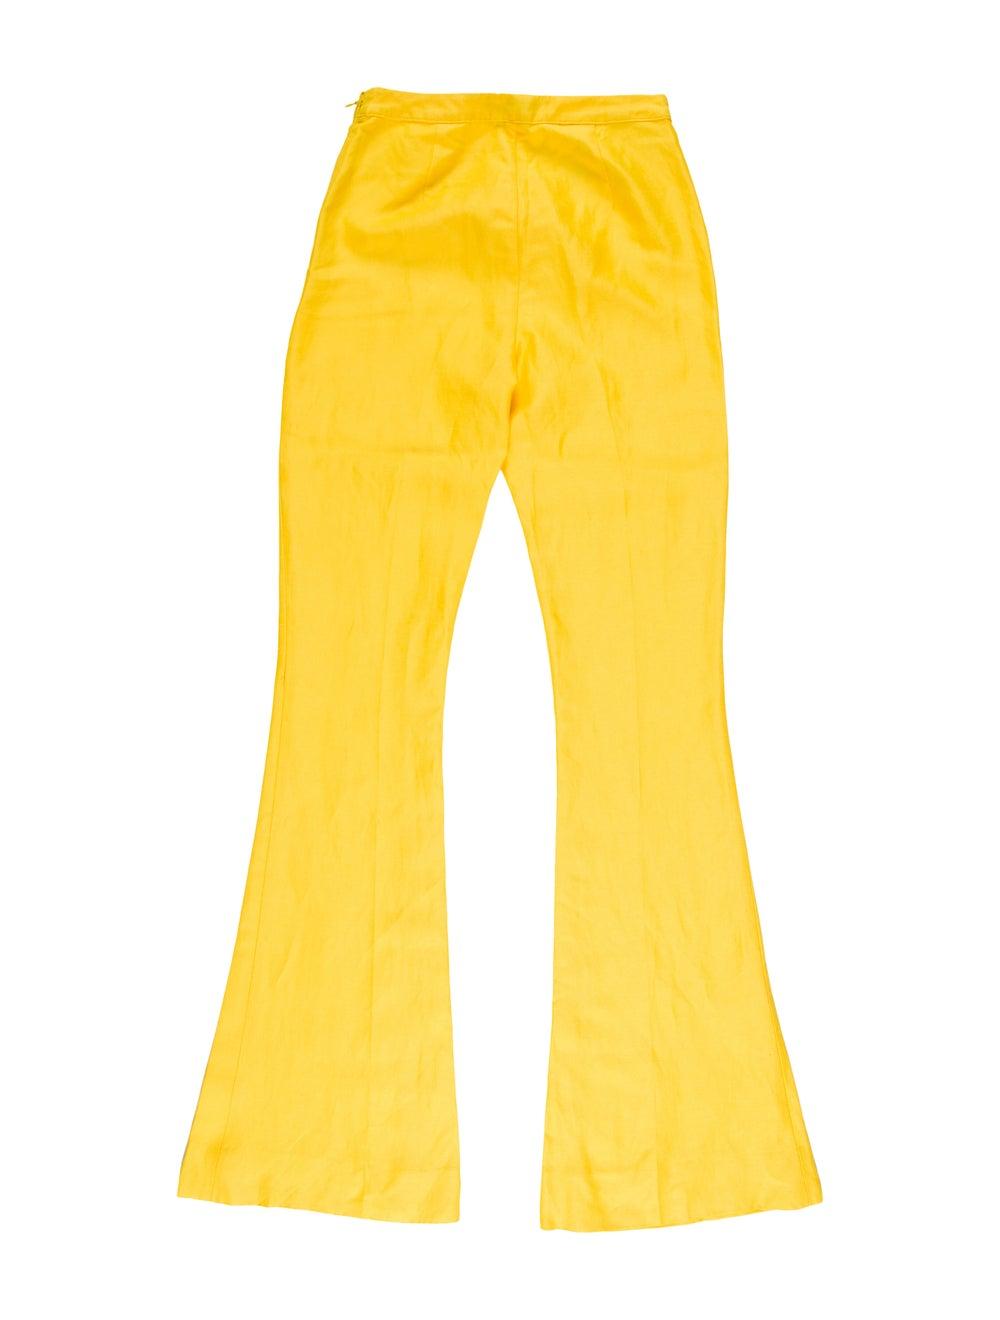 Mansur Gavriel Flared Pants w/ Tags Yellow - image 2